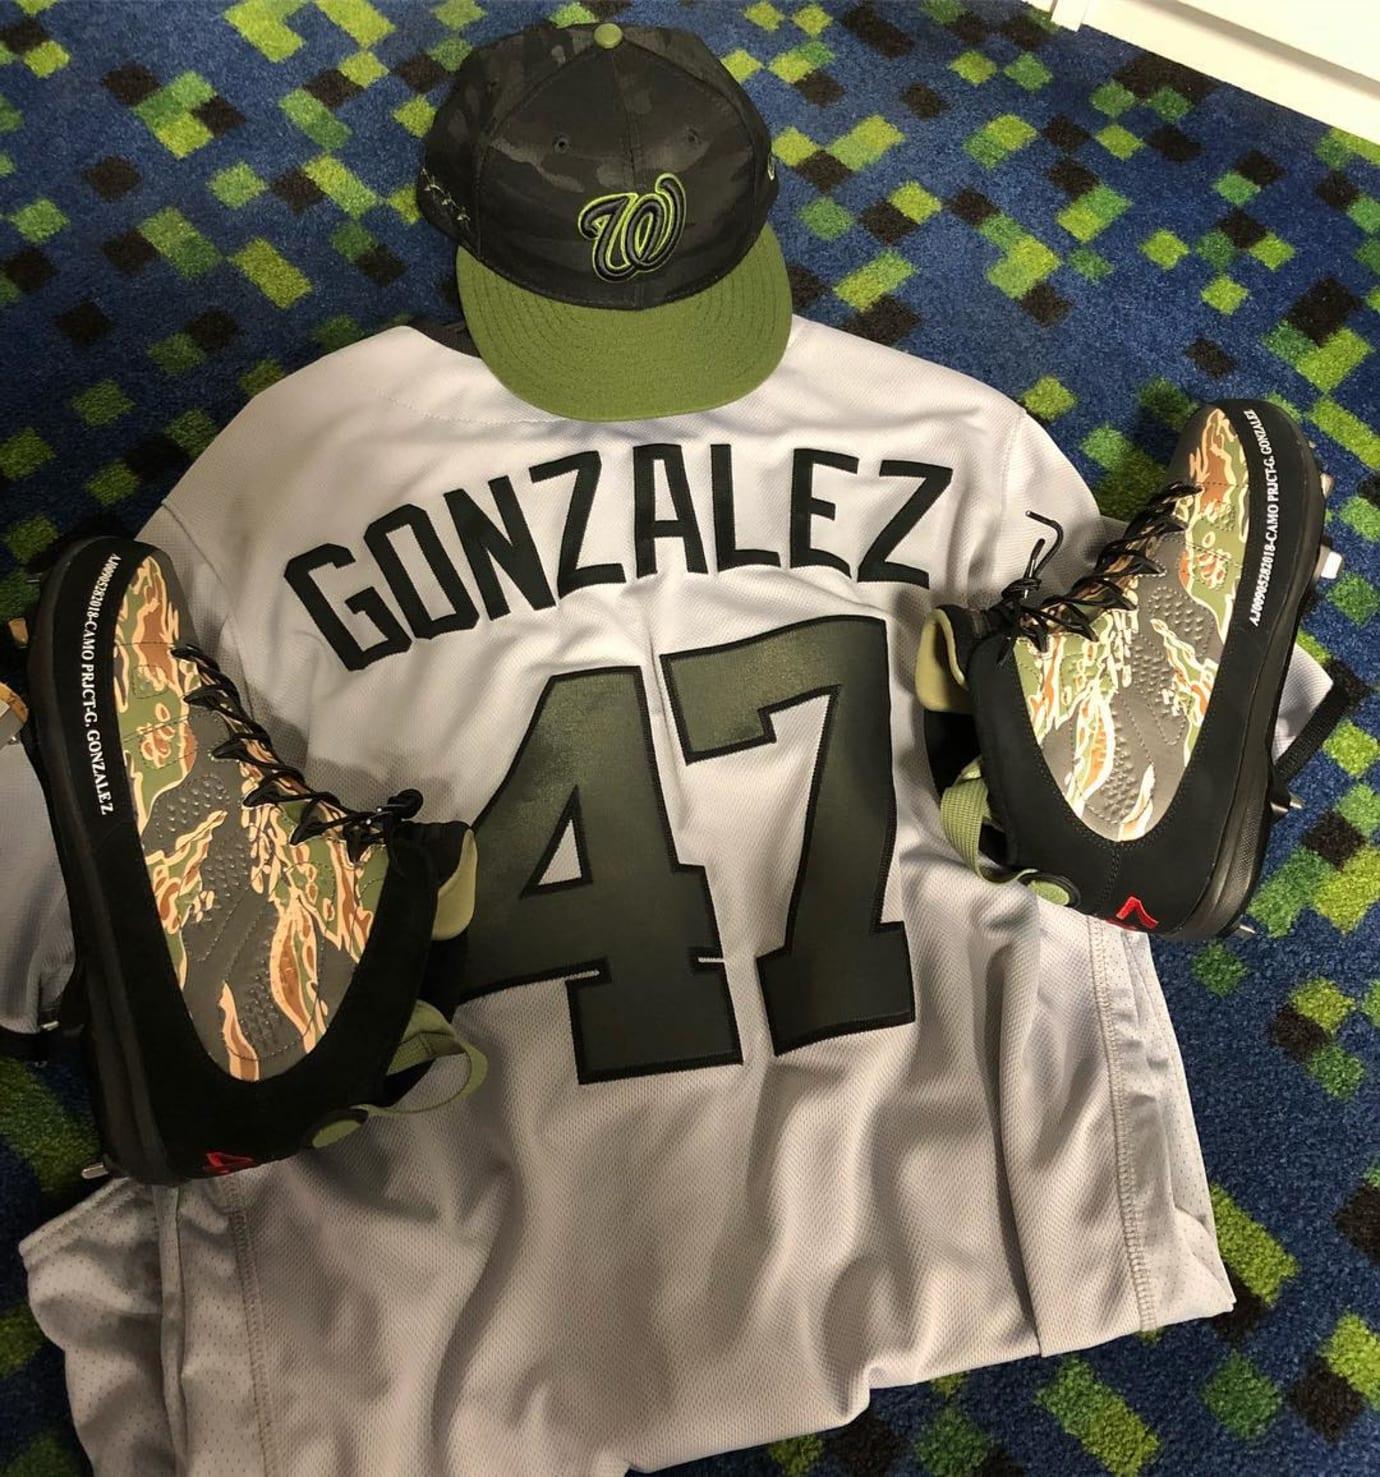 Air Jordan 9 Cleats Memorial Day Camo Gio Gonzalez